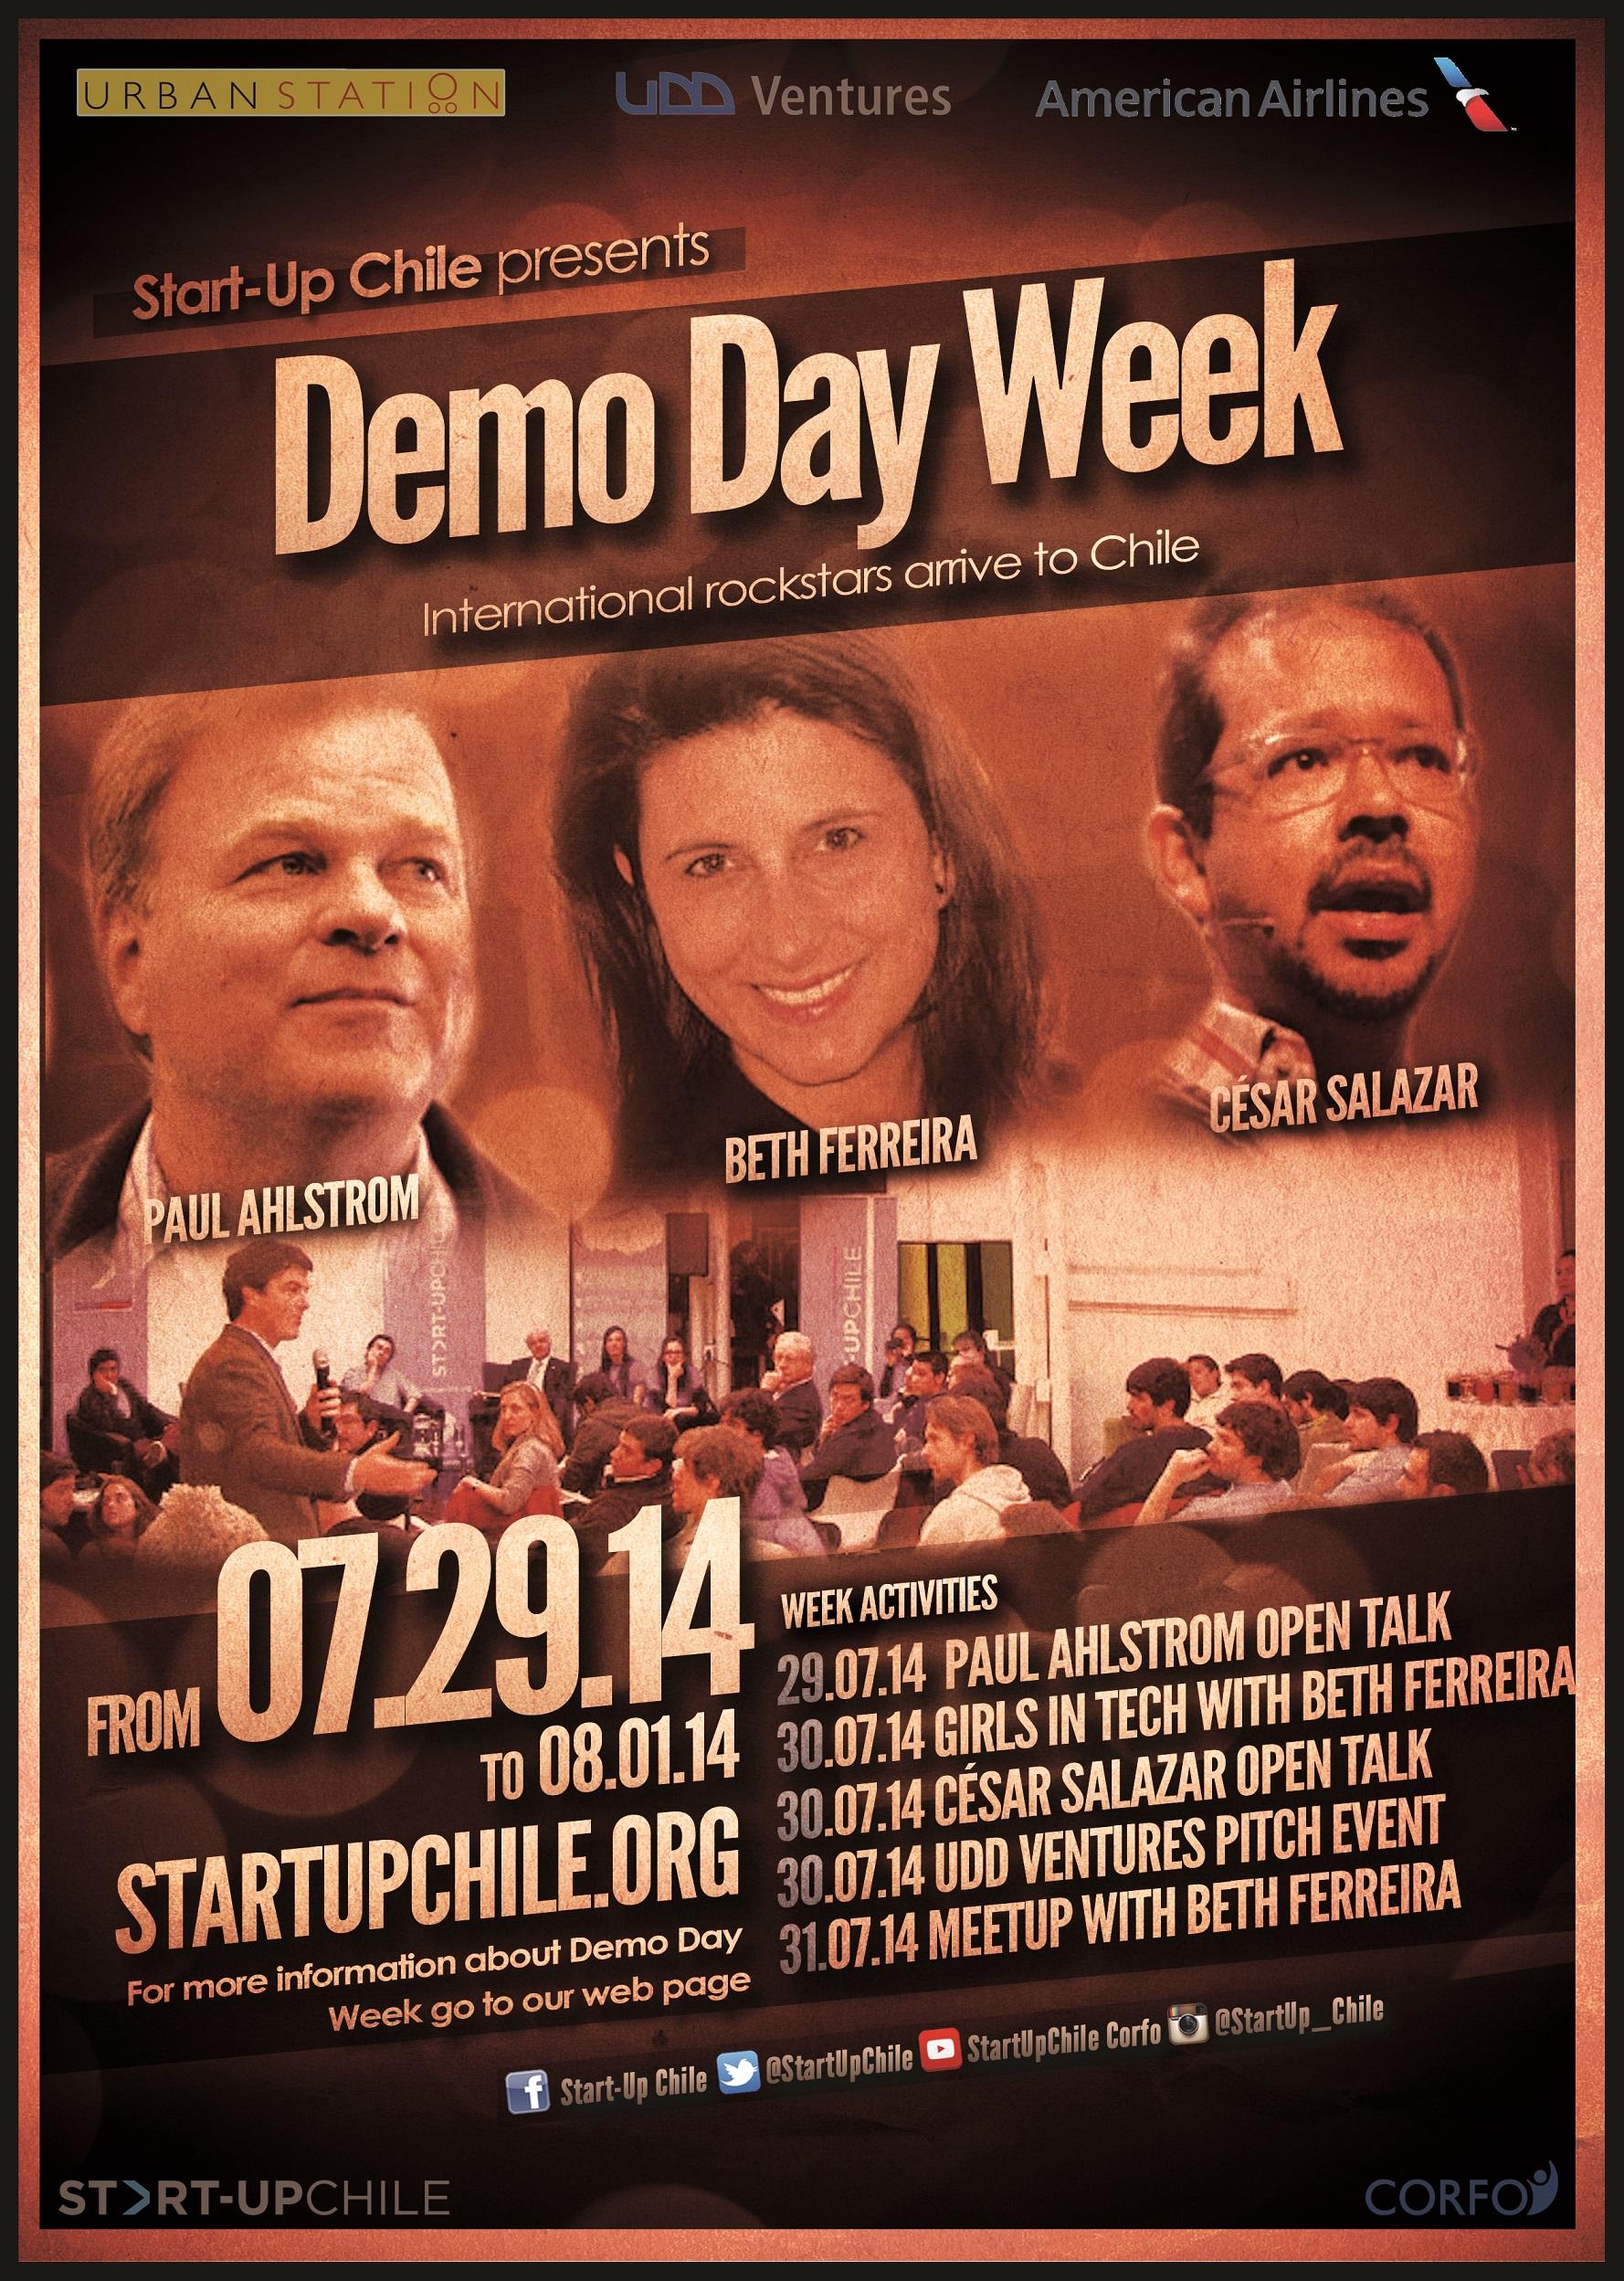 flyer demoday week eng